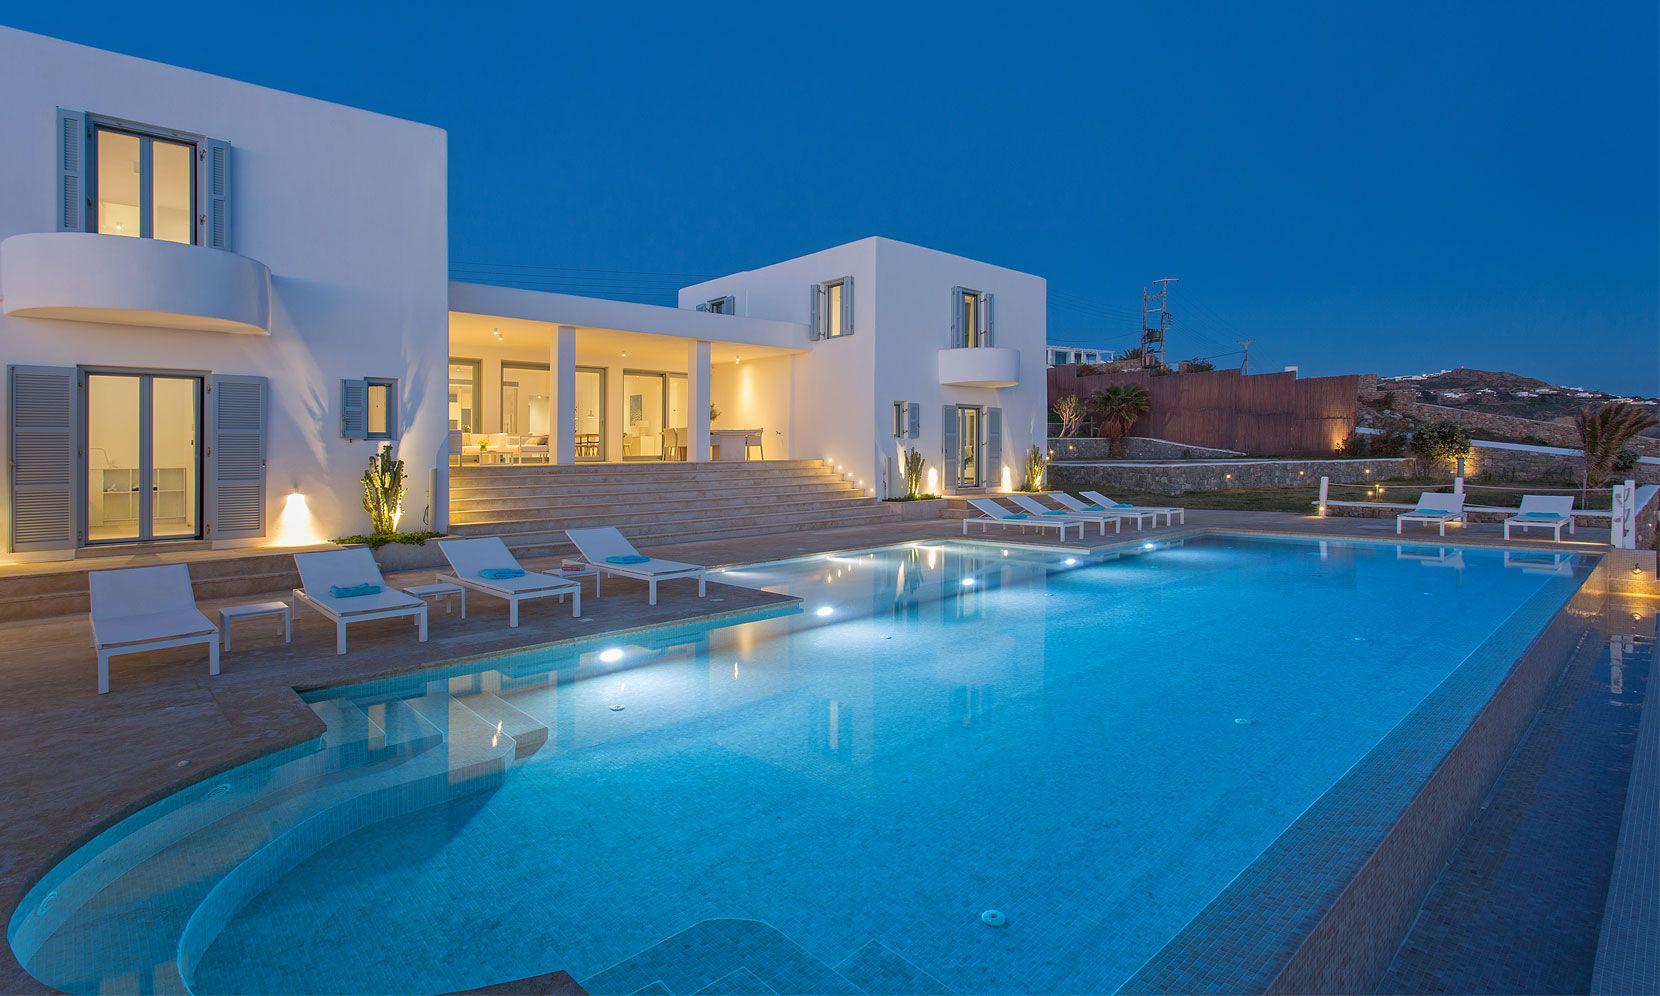 Mykonos Villa Dawn jumbotron image